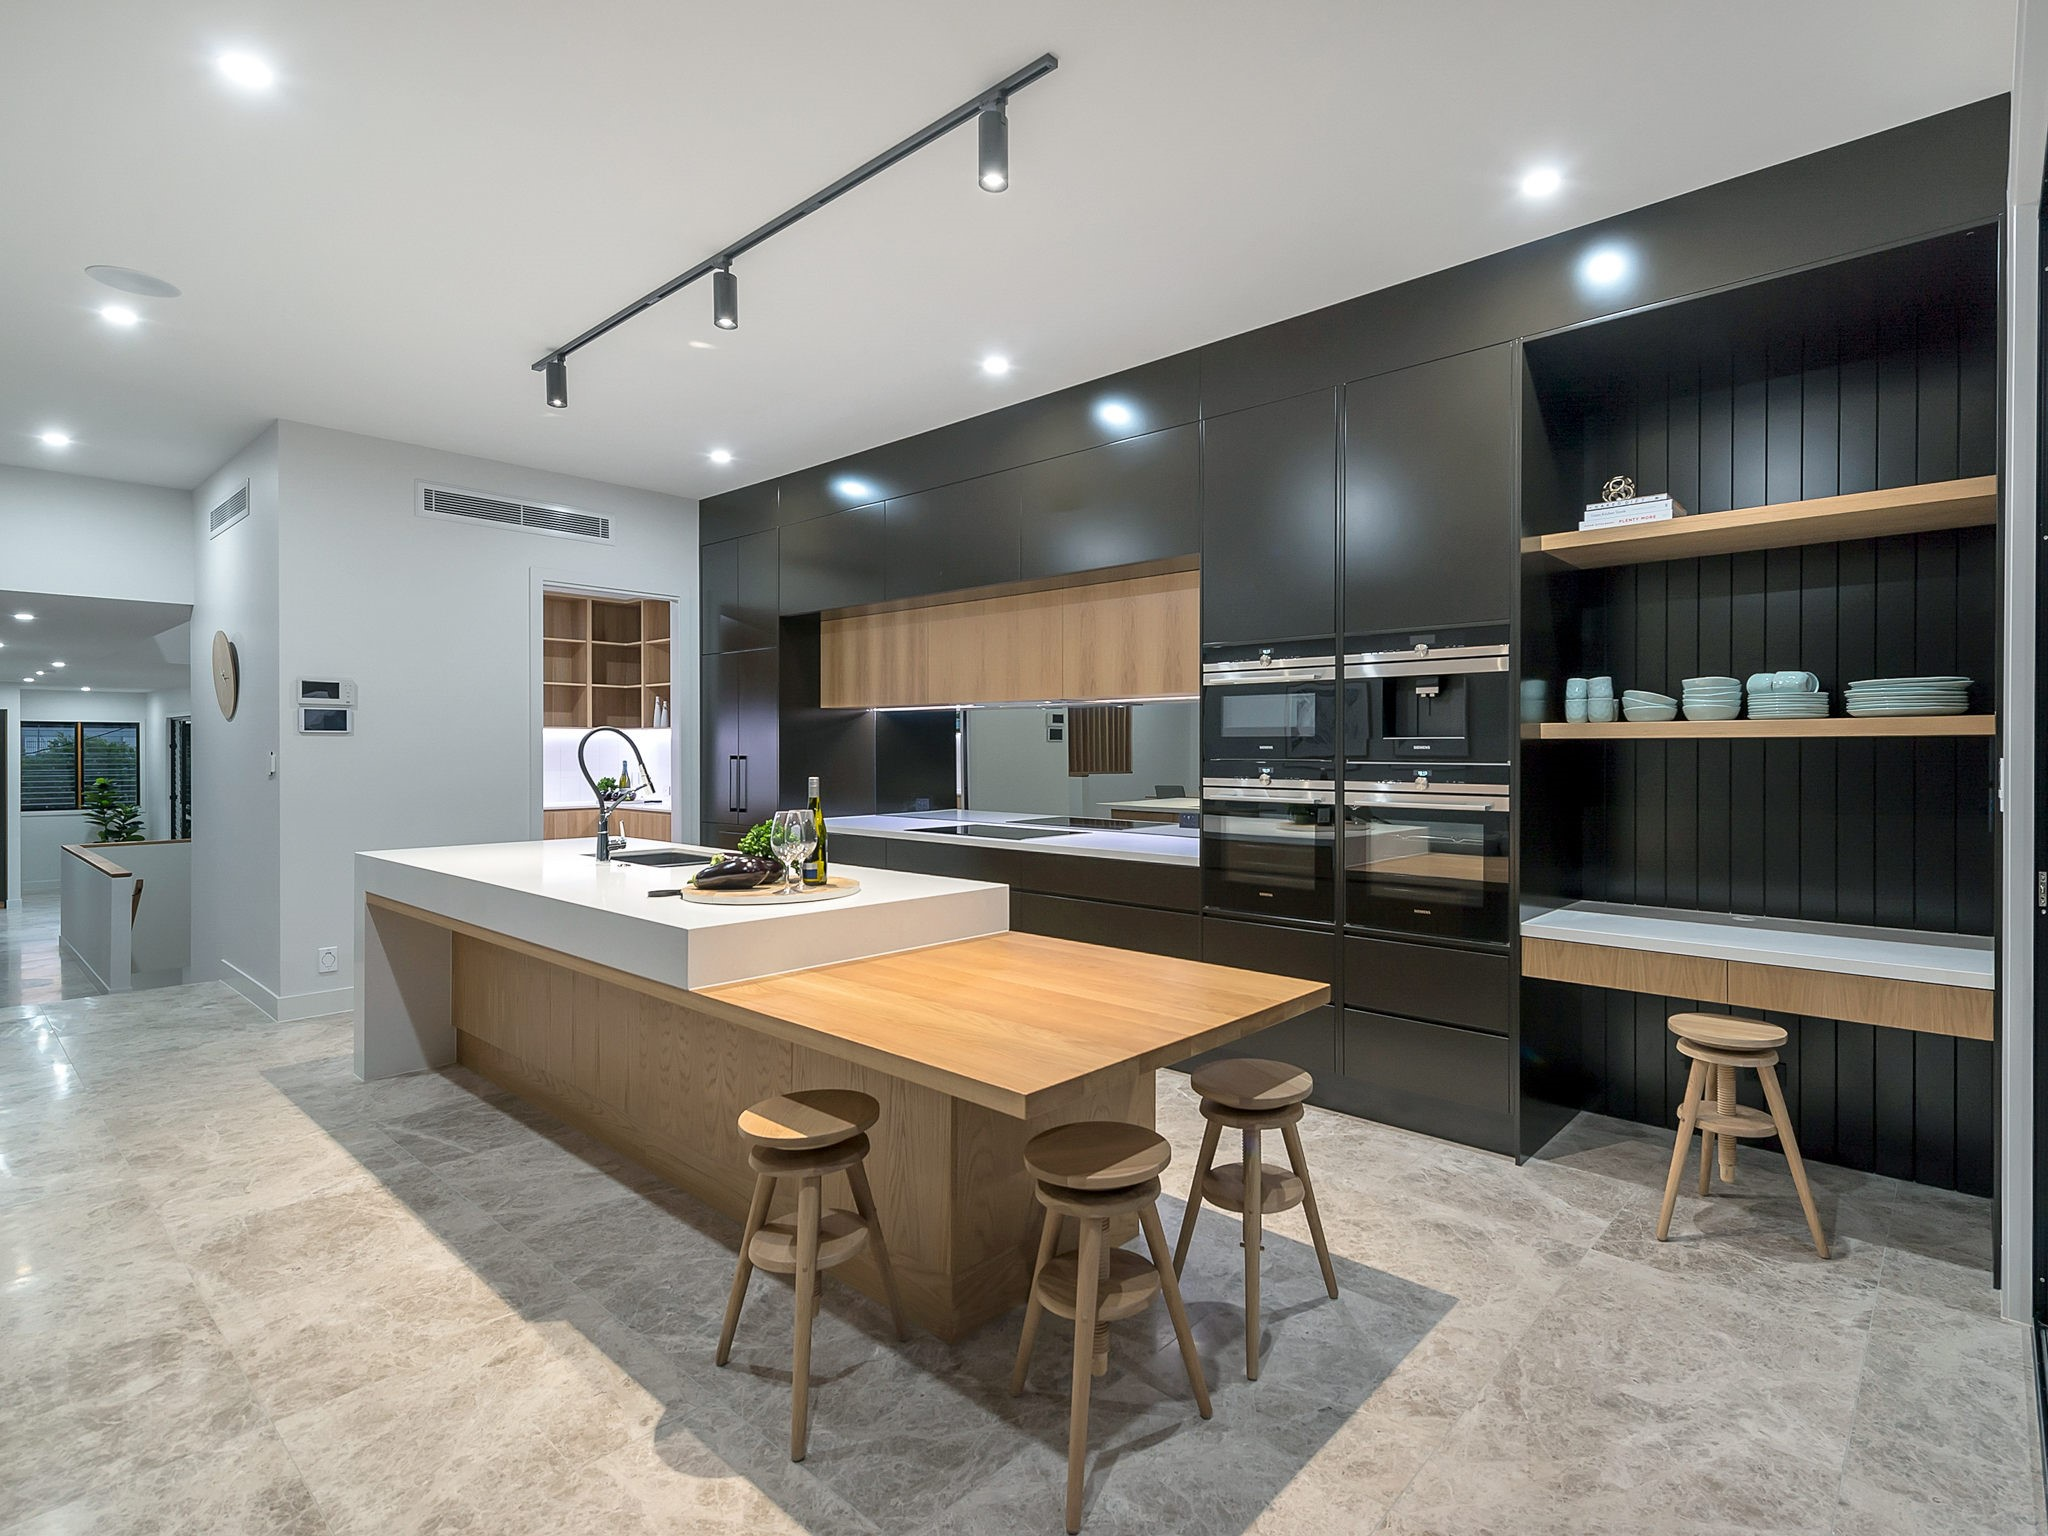 New Kitchens Designs For Sale Brisbane